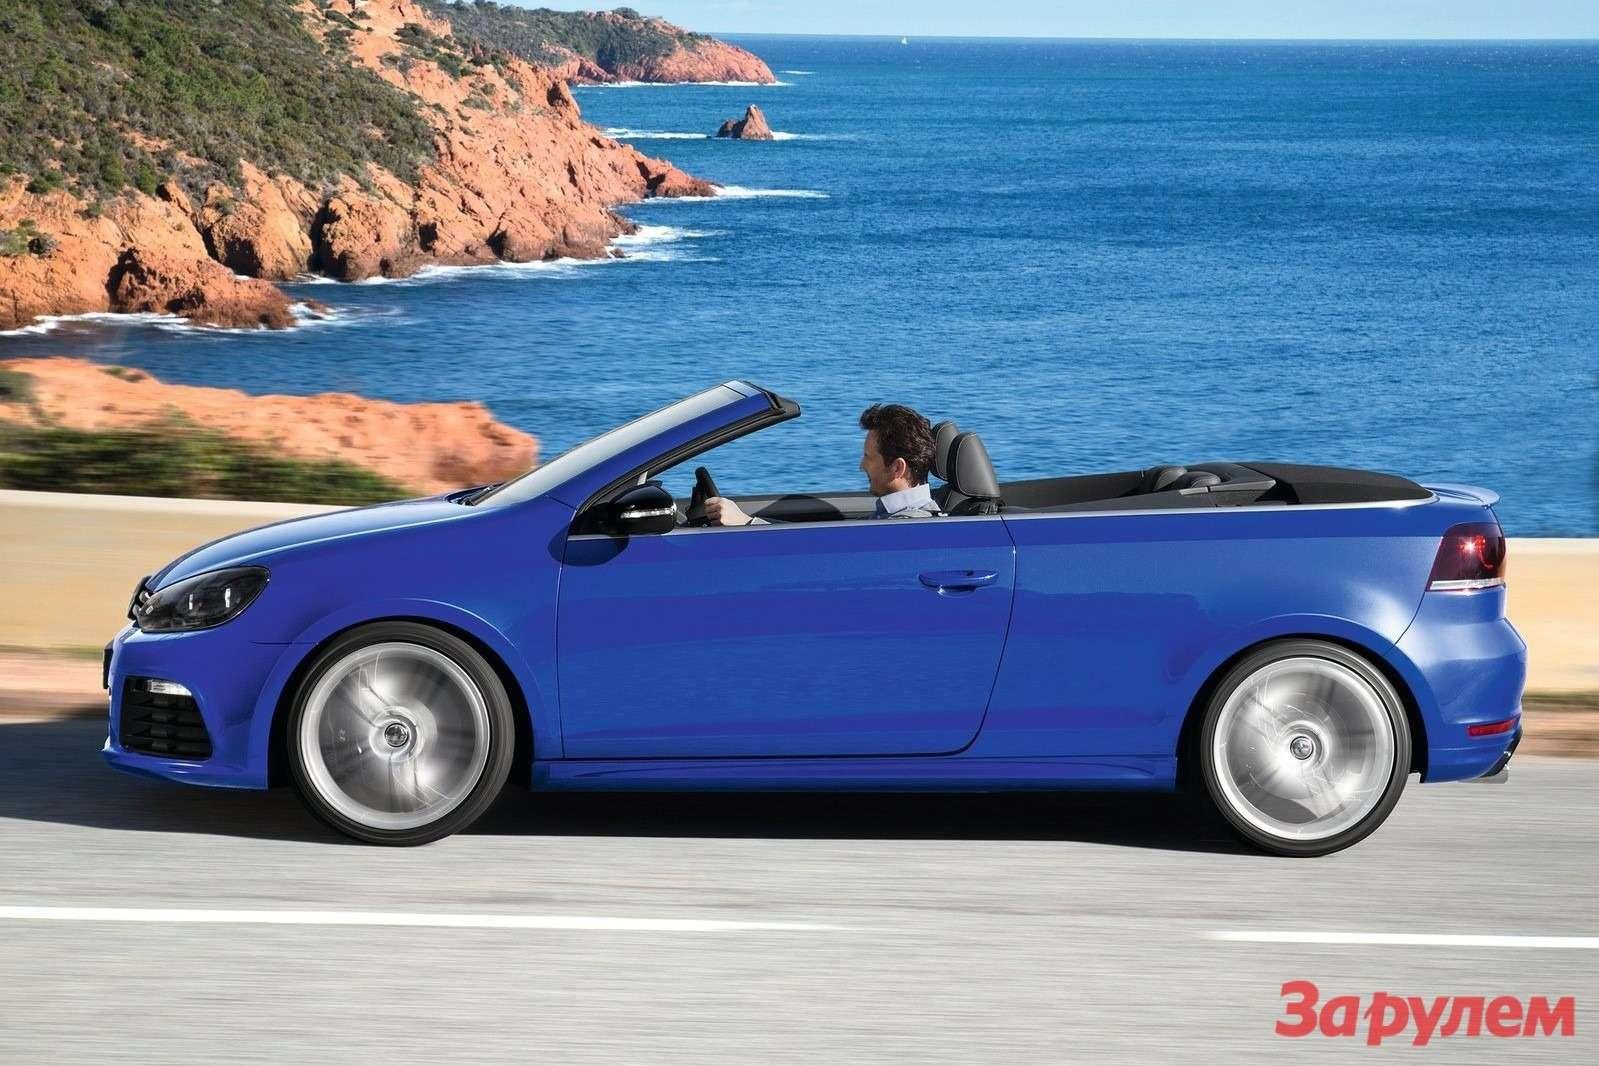 Volkswagen-Golf_R_Cabriolet_2014_1600x1200_wallpaper_08